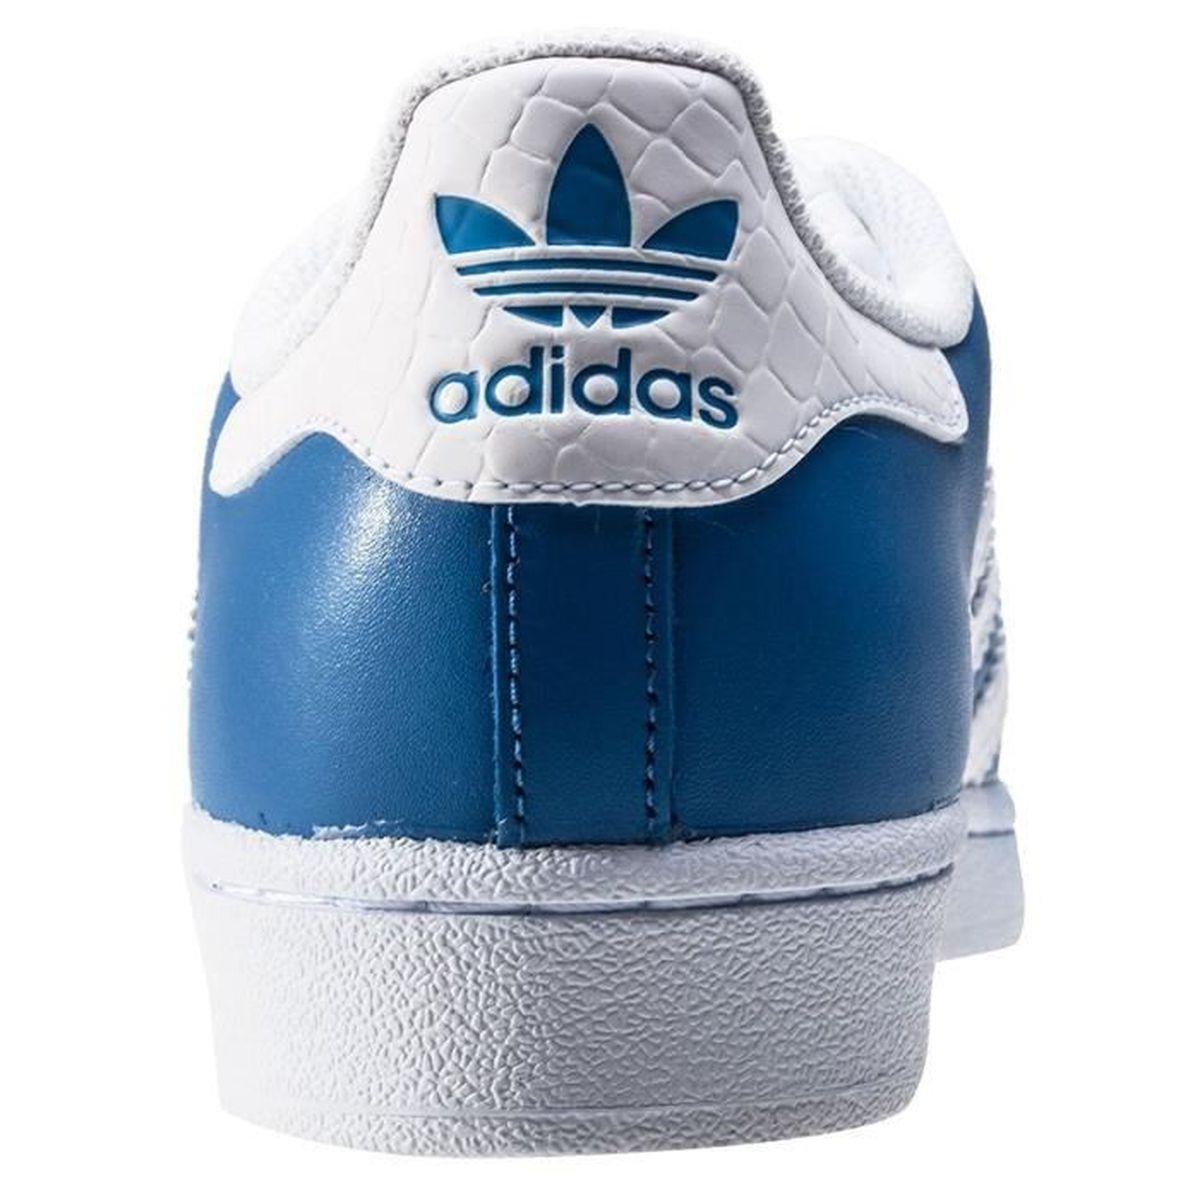 check out d83df 960db Bleu Achat Homme Superstar Adidas Moda Vente S75881 Basket wqXIWBS